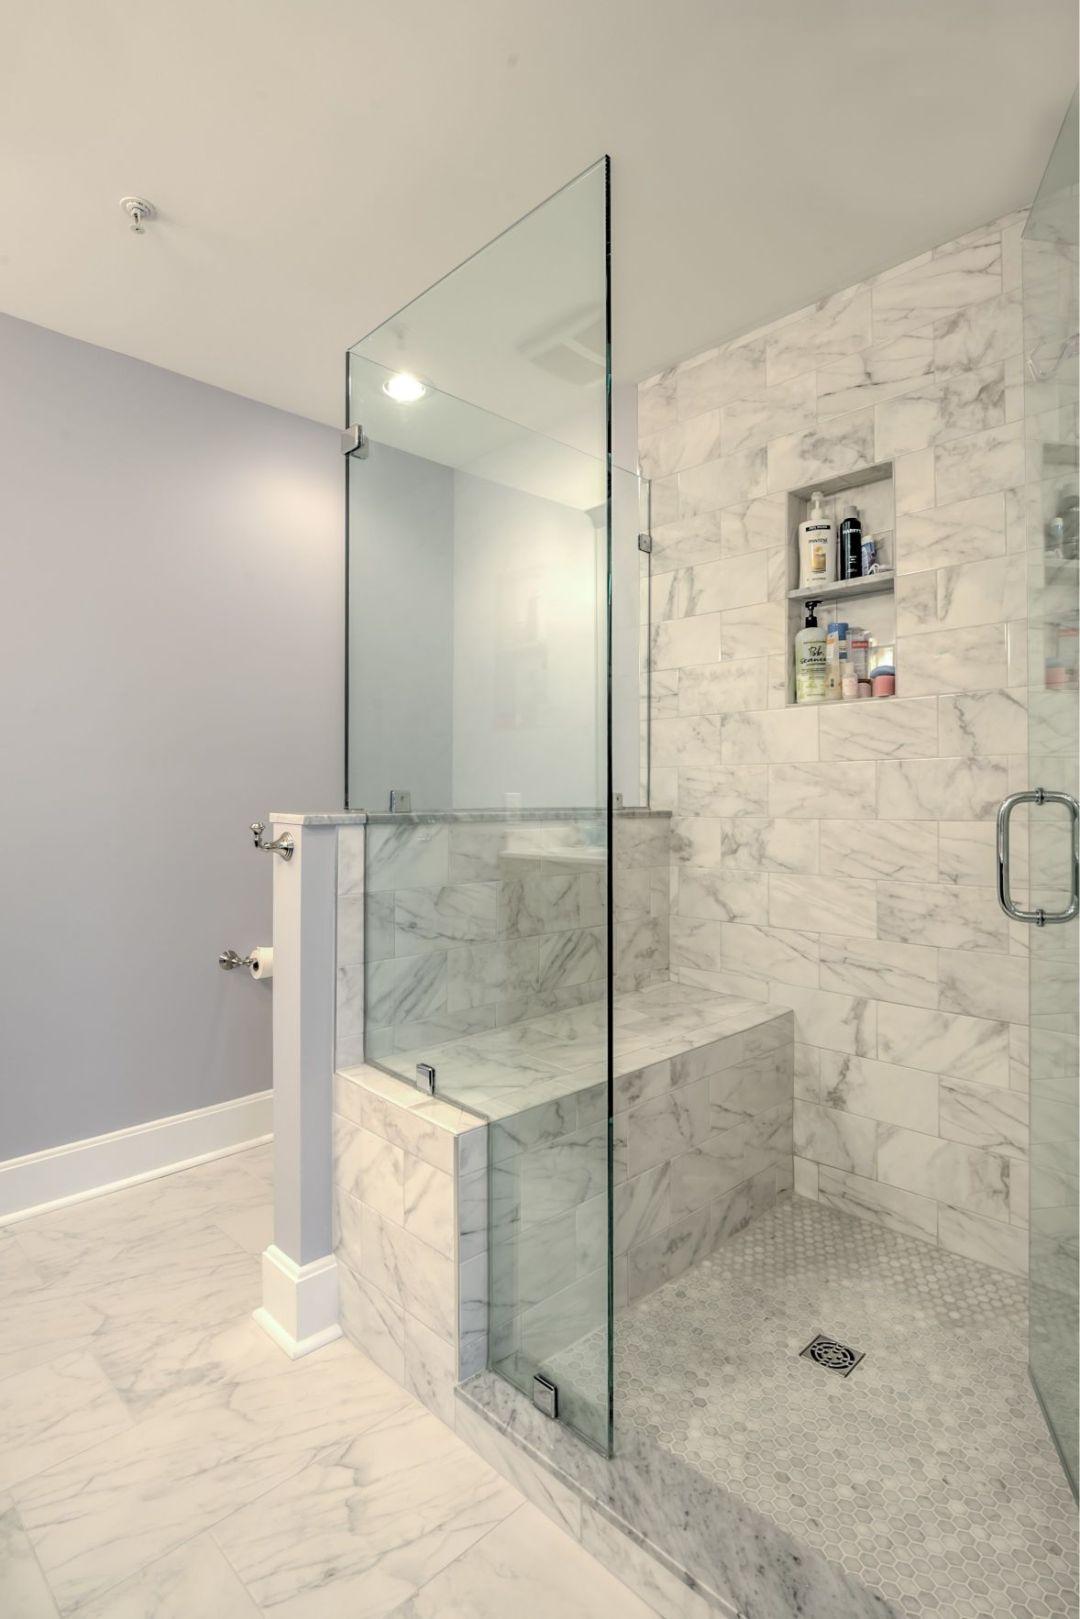 Bathroom Remodel in Kings Grant, Fenwick Island DE with Mosaic Shower Floor Tiles